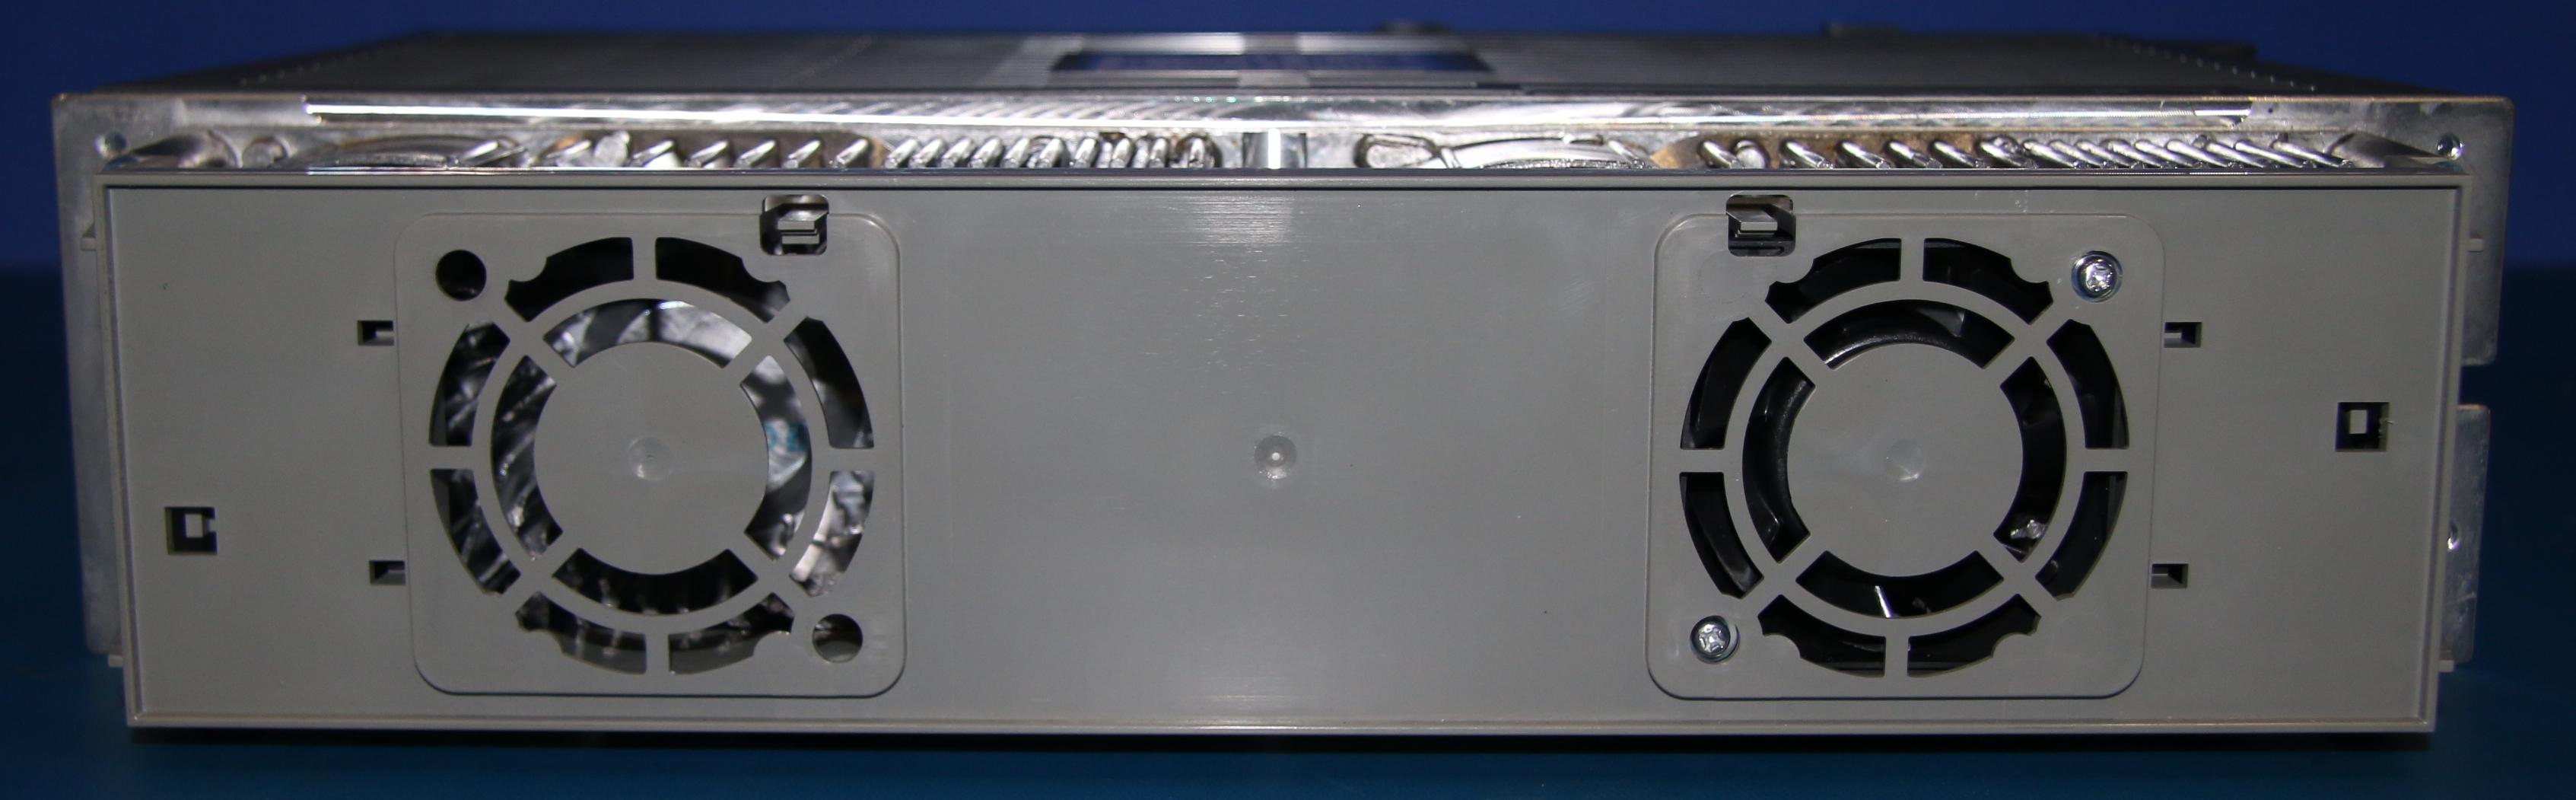 (1) New Mitsubishi MDS-D-CV-110 Power Supply Unit 15097